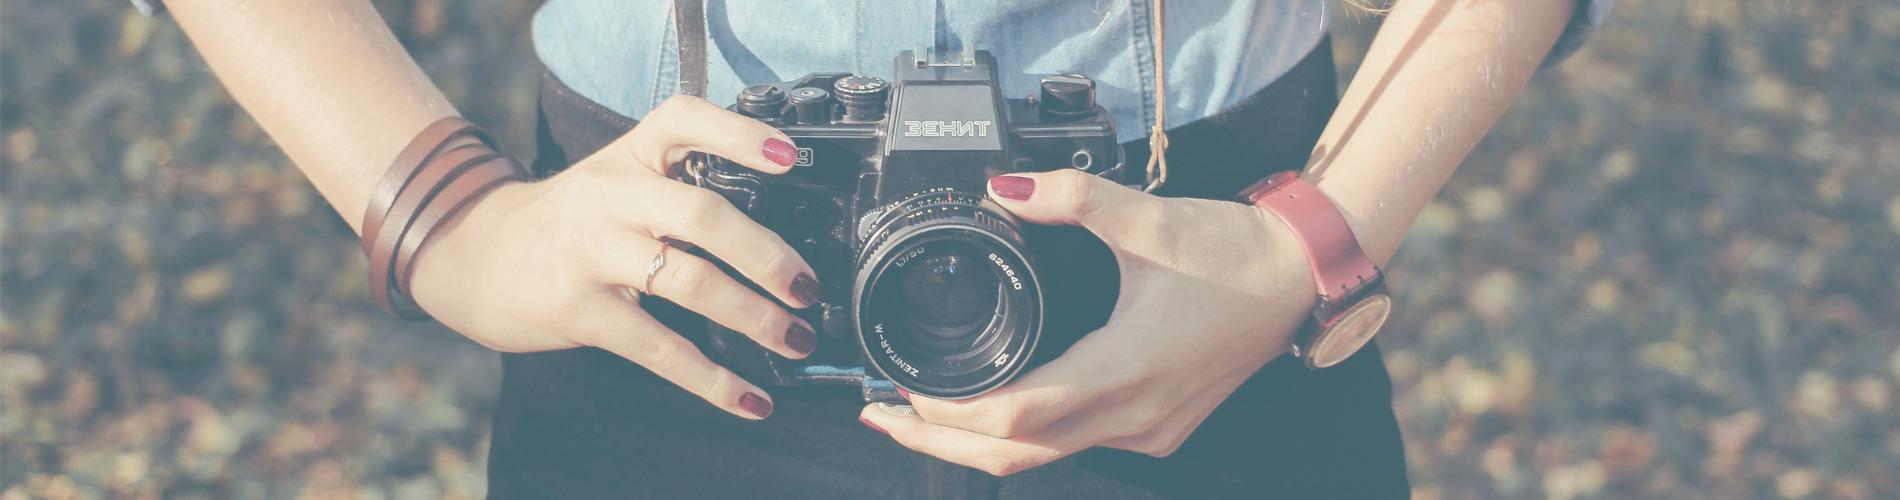 mls corelogic photography rights